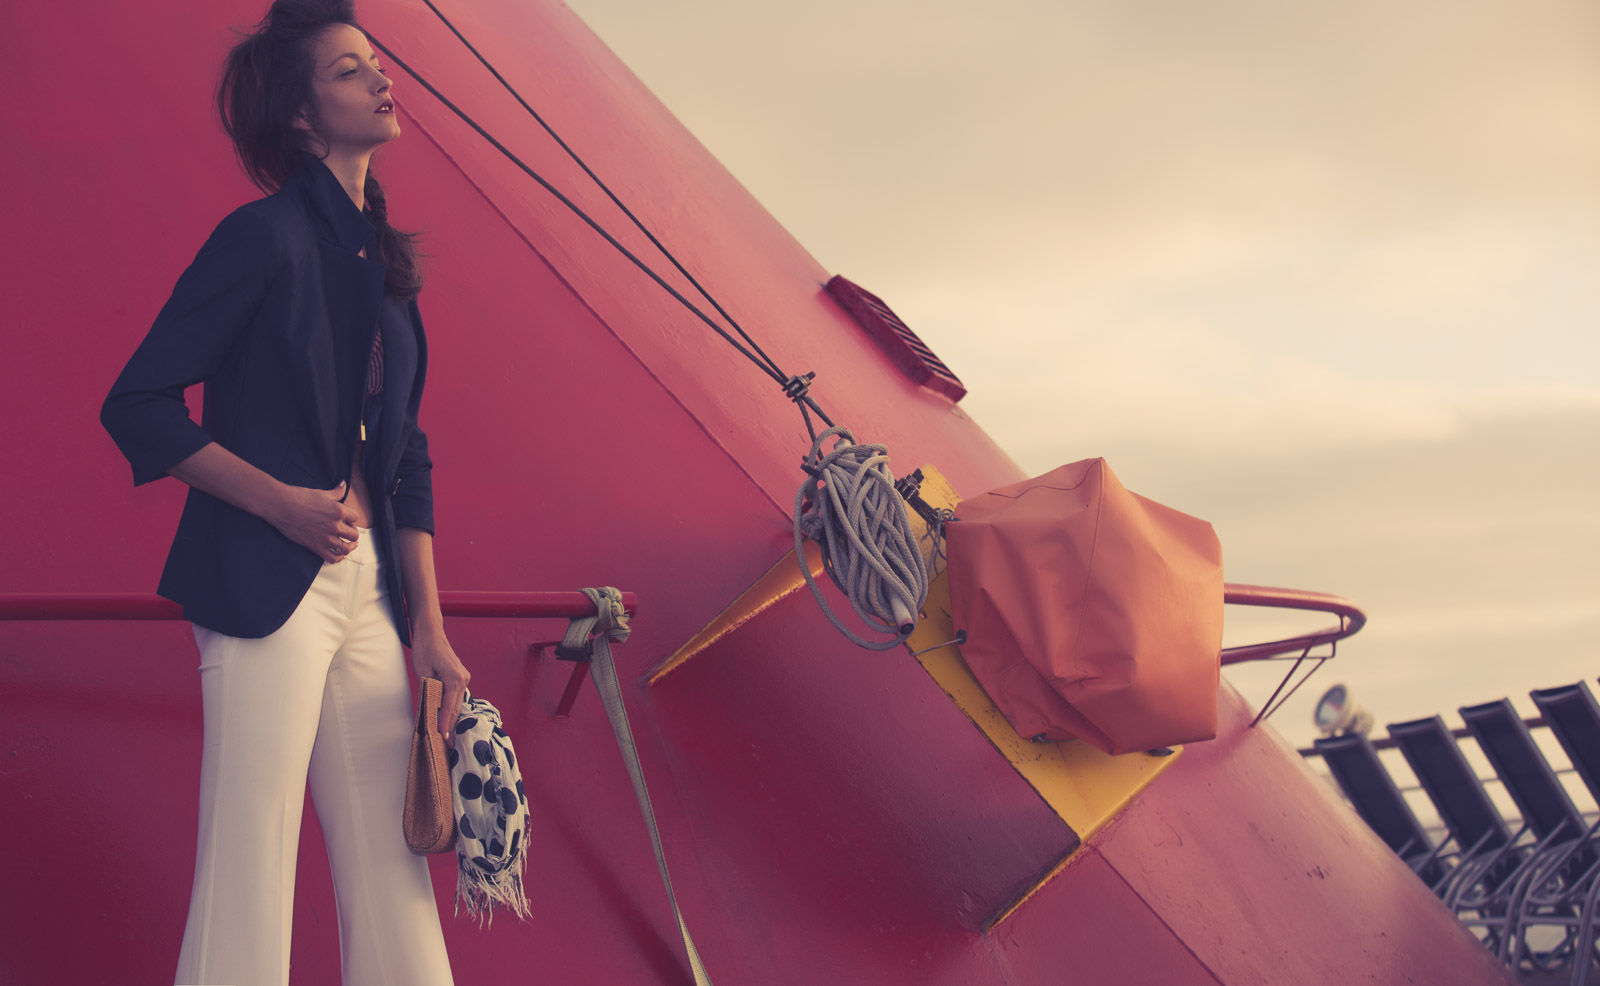 Model: Tatiana Junqueira. Photo by LA Fashion Photographer James Hickey.